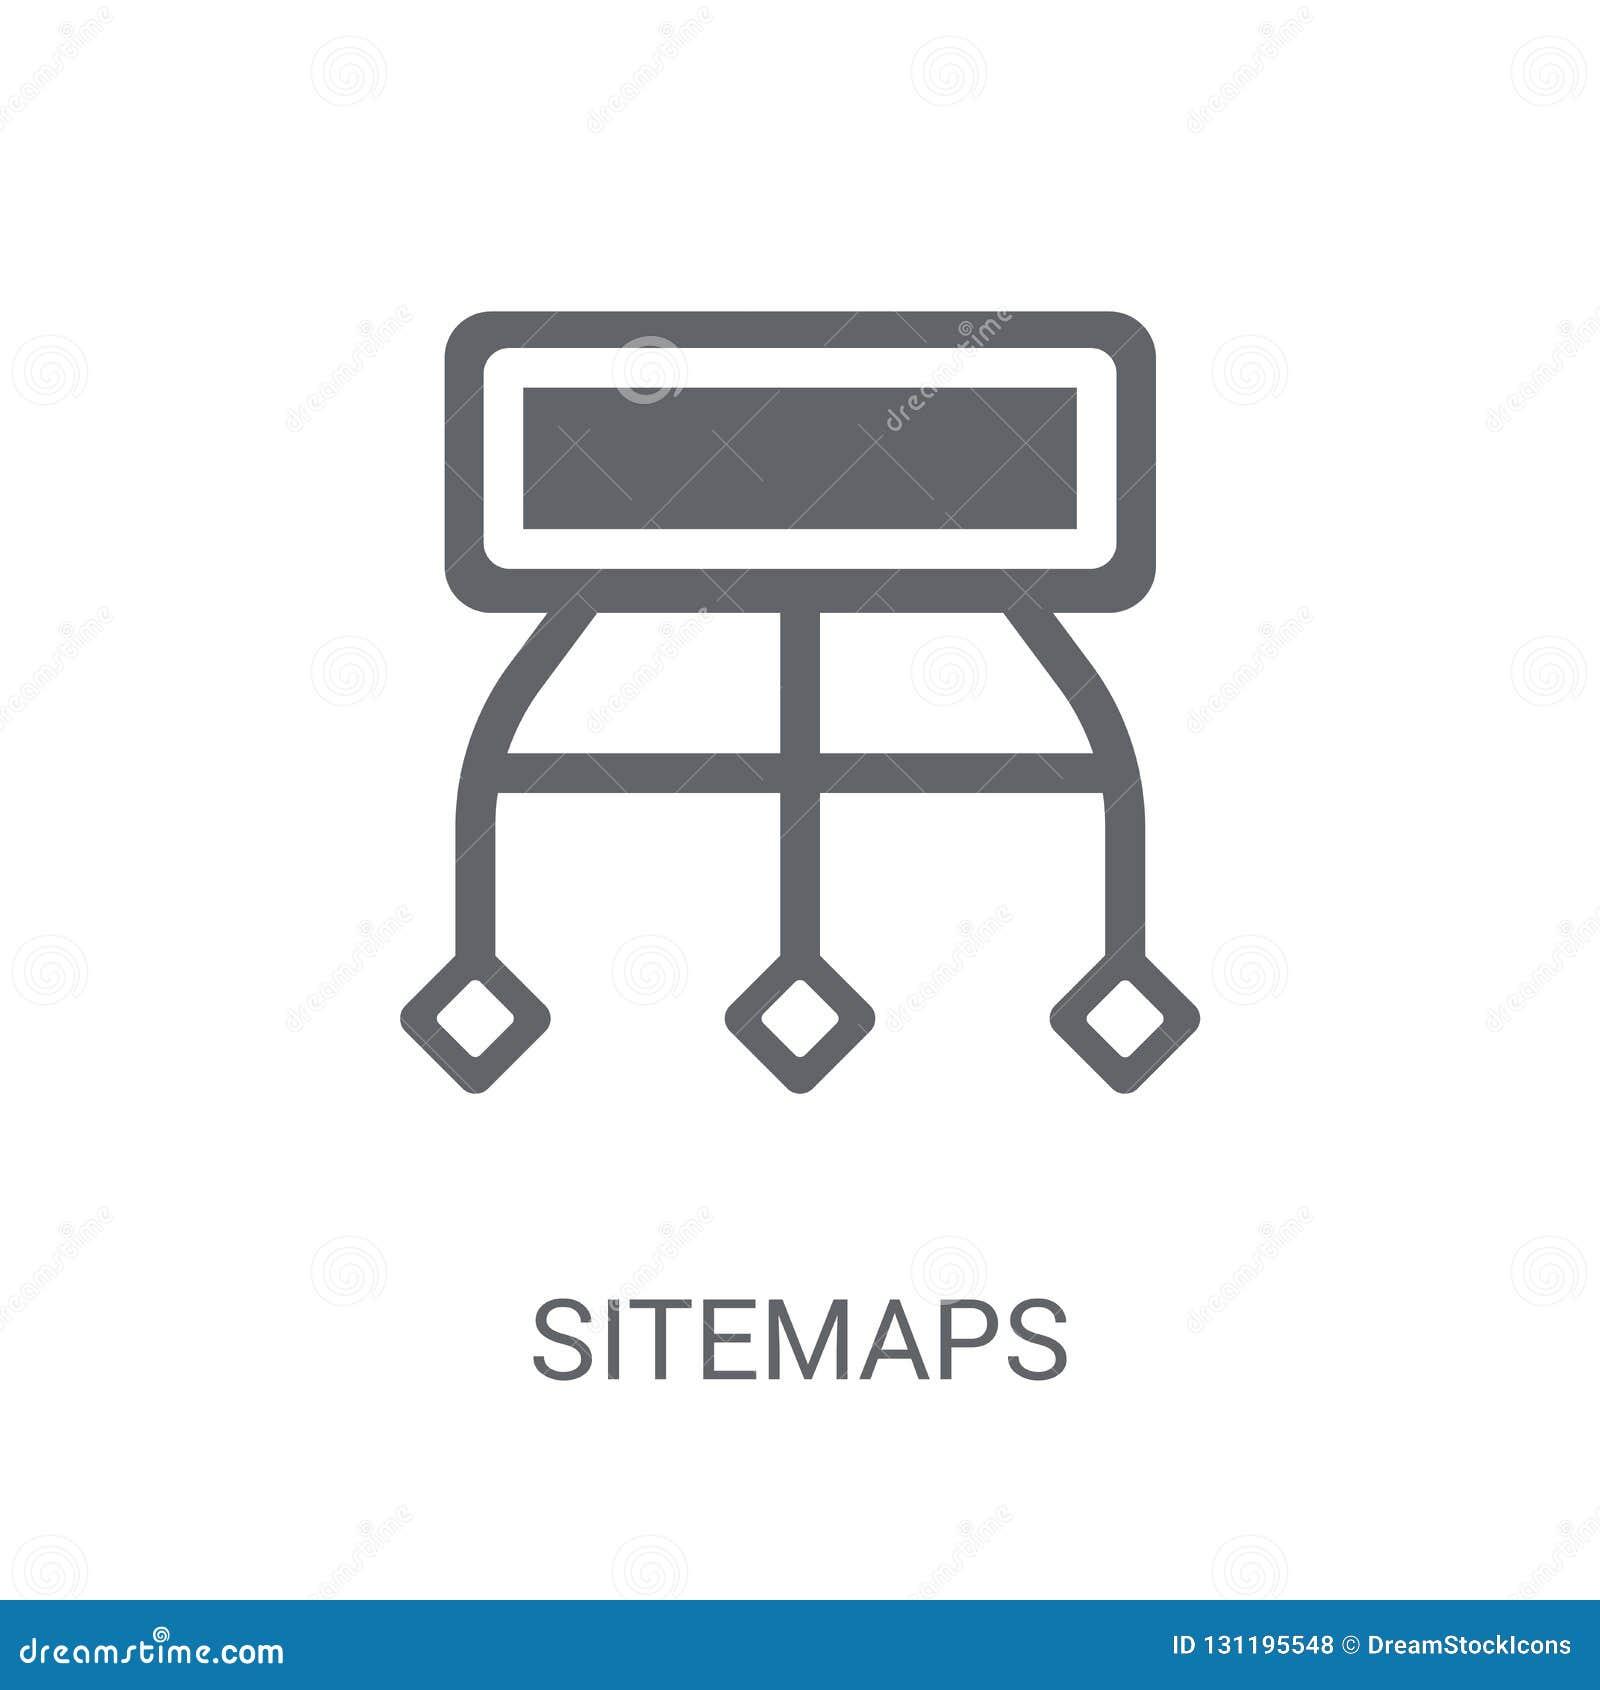 Sitemaps icon. Trendy Sitemaps logo concept on white background